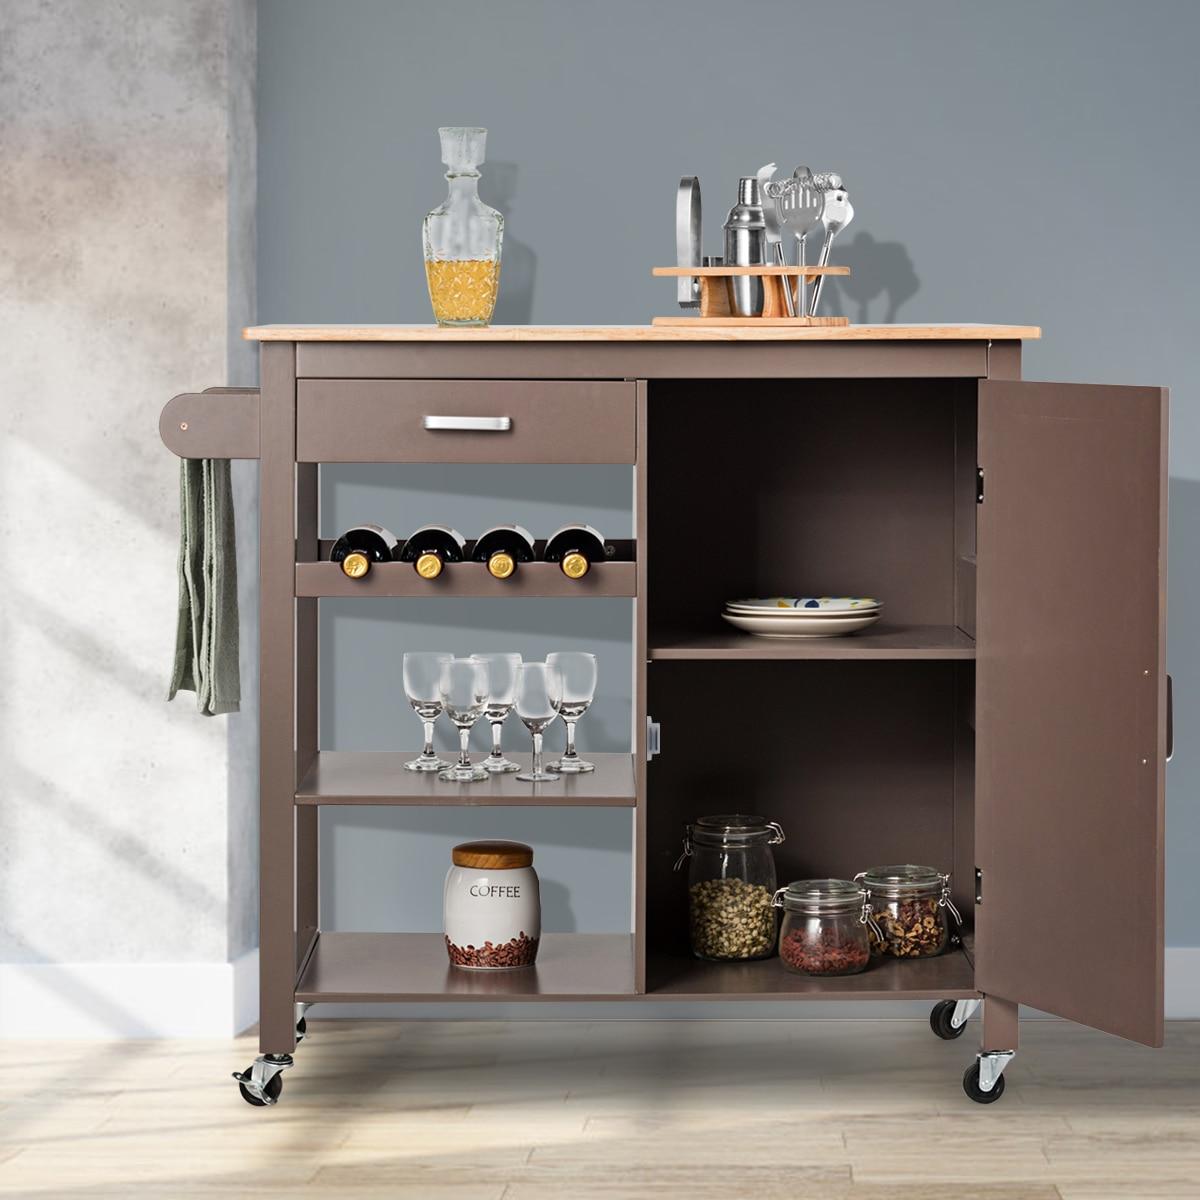 Costway Kitchen Island Trolley Cart Wood Top Storage Cabinet w/ Wine Rack & Shelf Brown